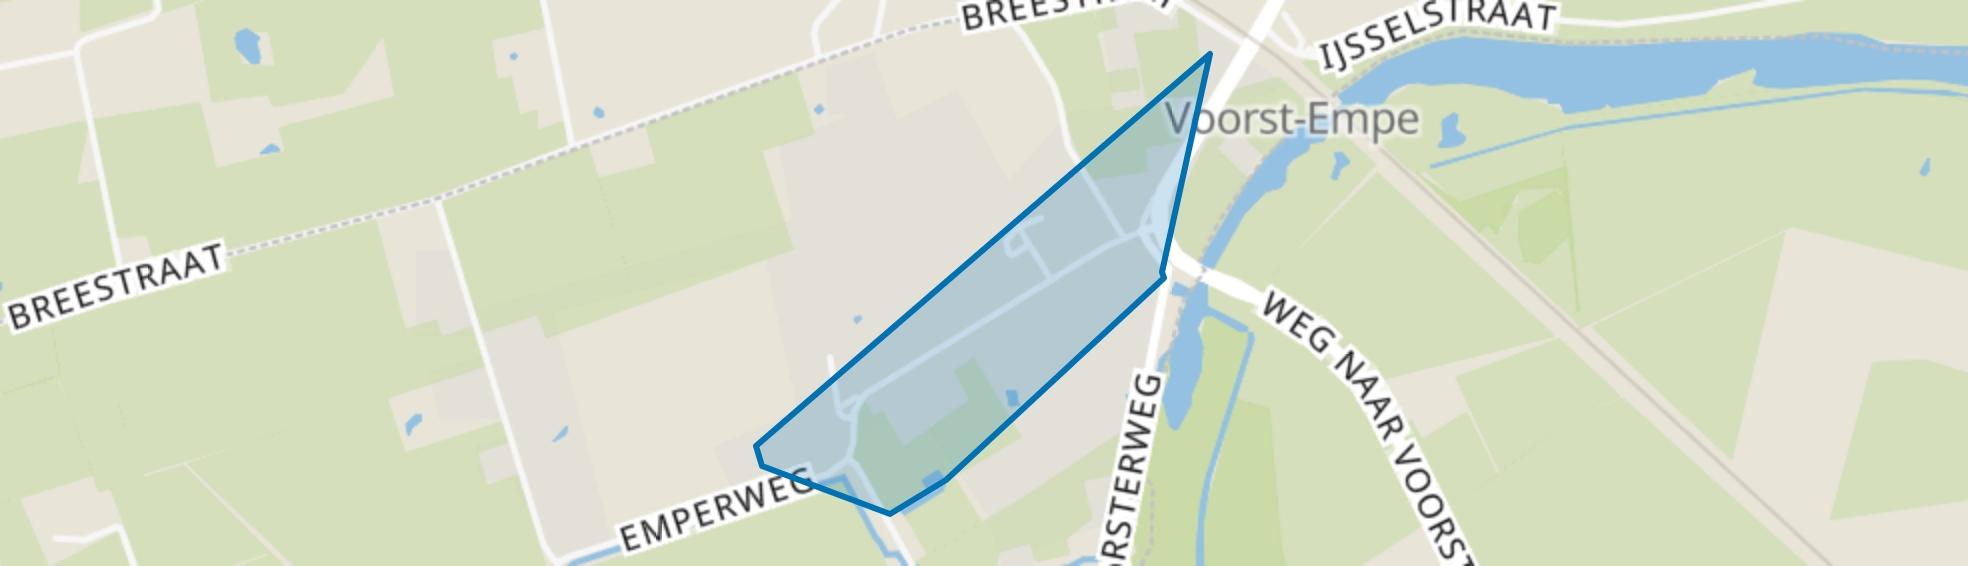 Empe Kern, Empe map